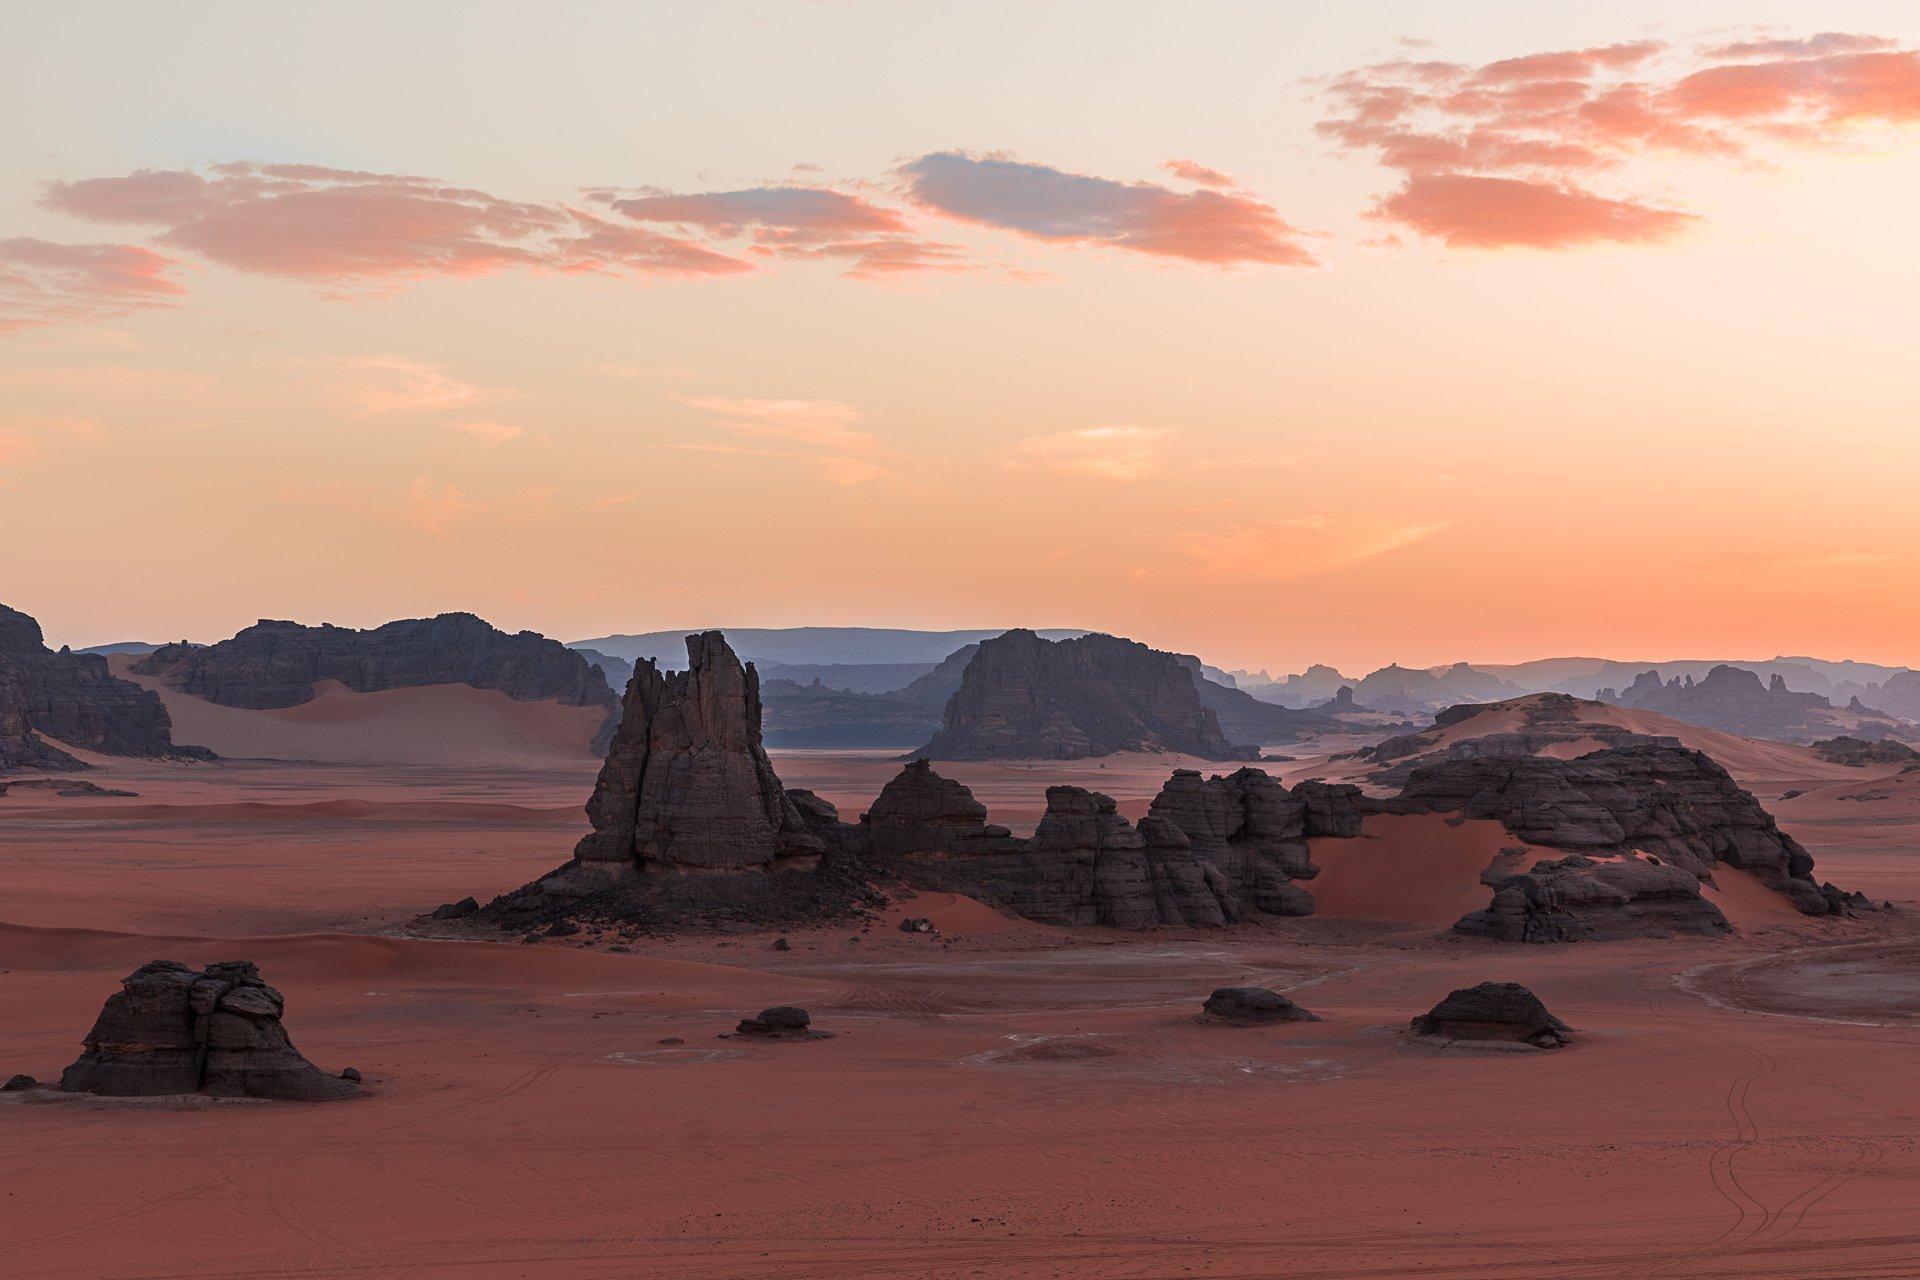 алжир, сахара, тадрарт, пустыня, песок, закат, Marina Malikova